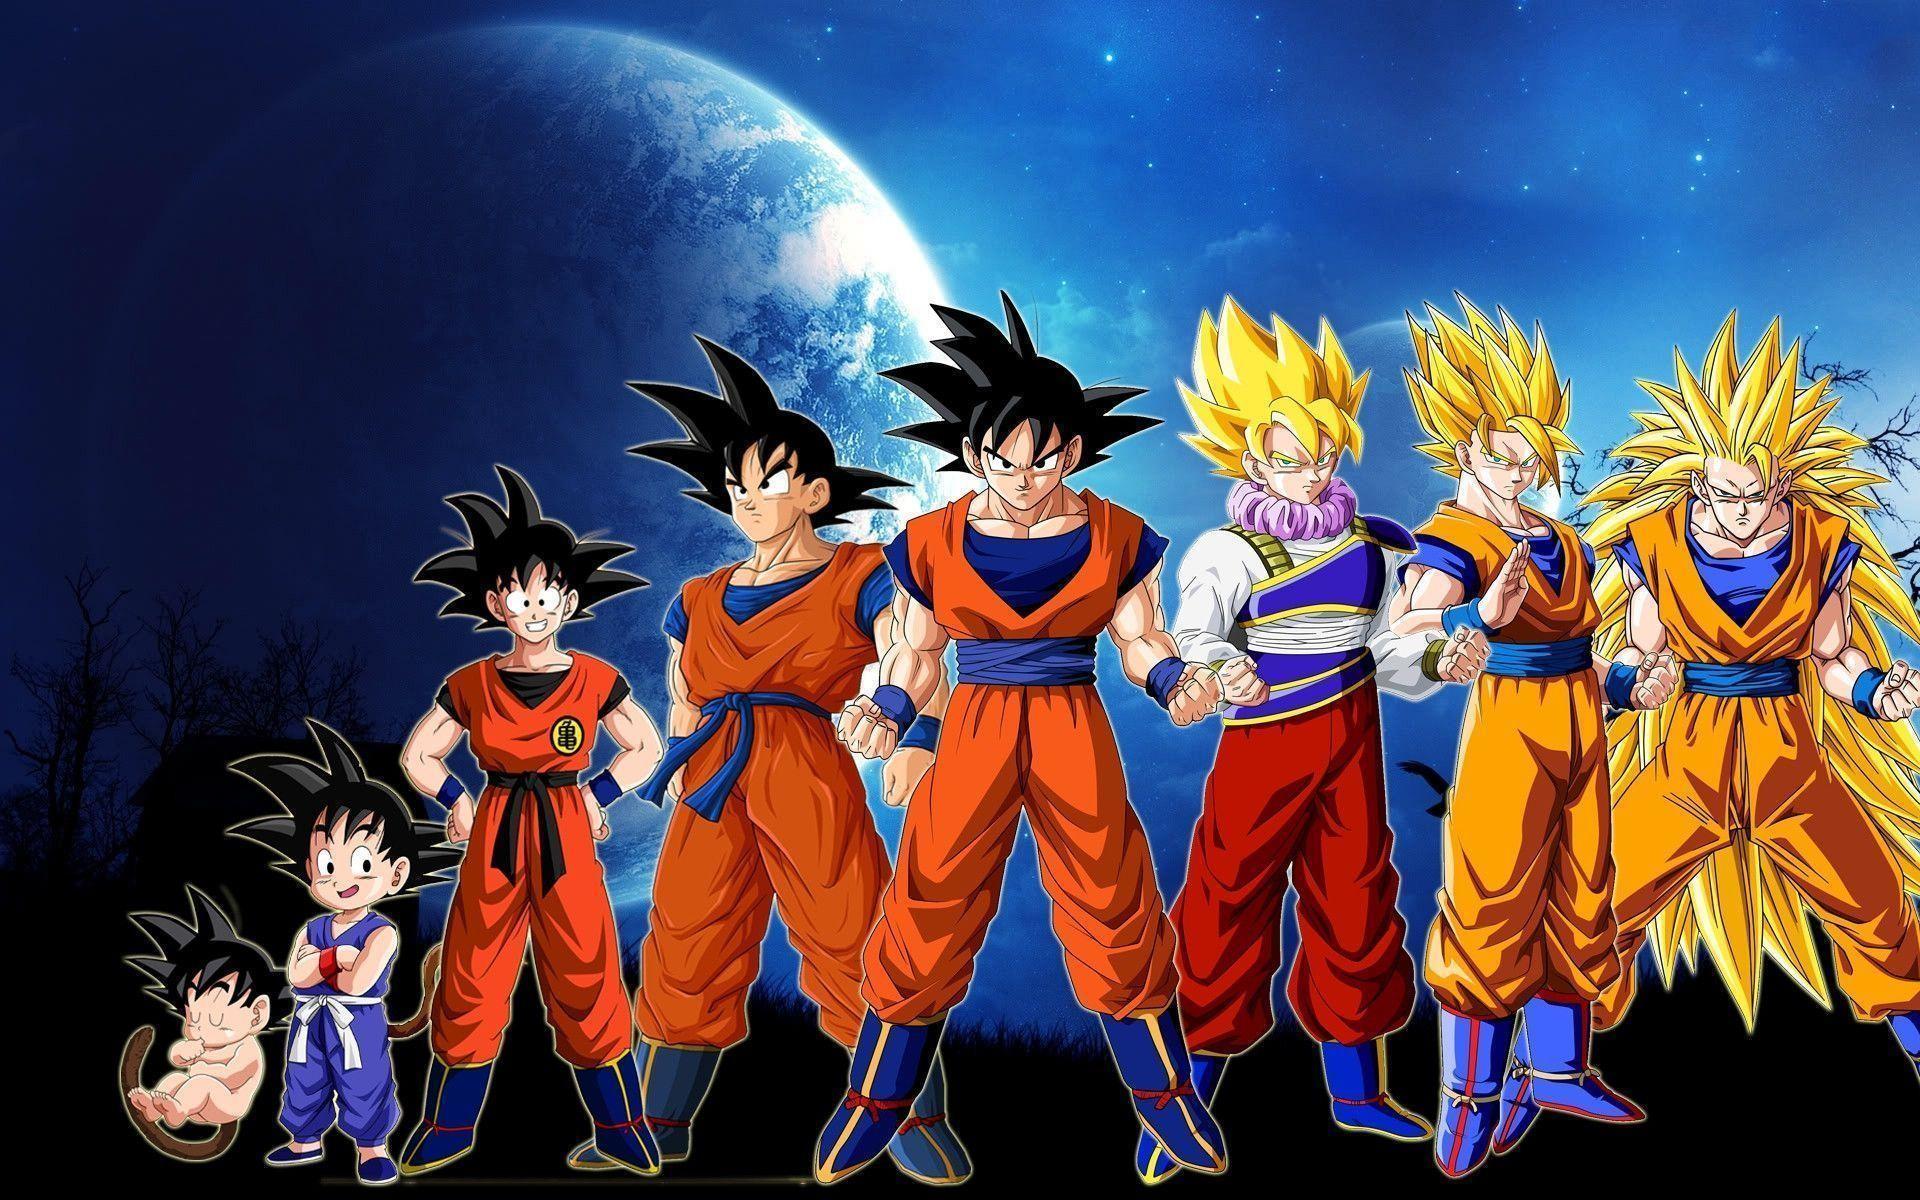 Download Dragonball Goku Evolution Anime Hd Wallpaper .